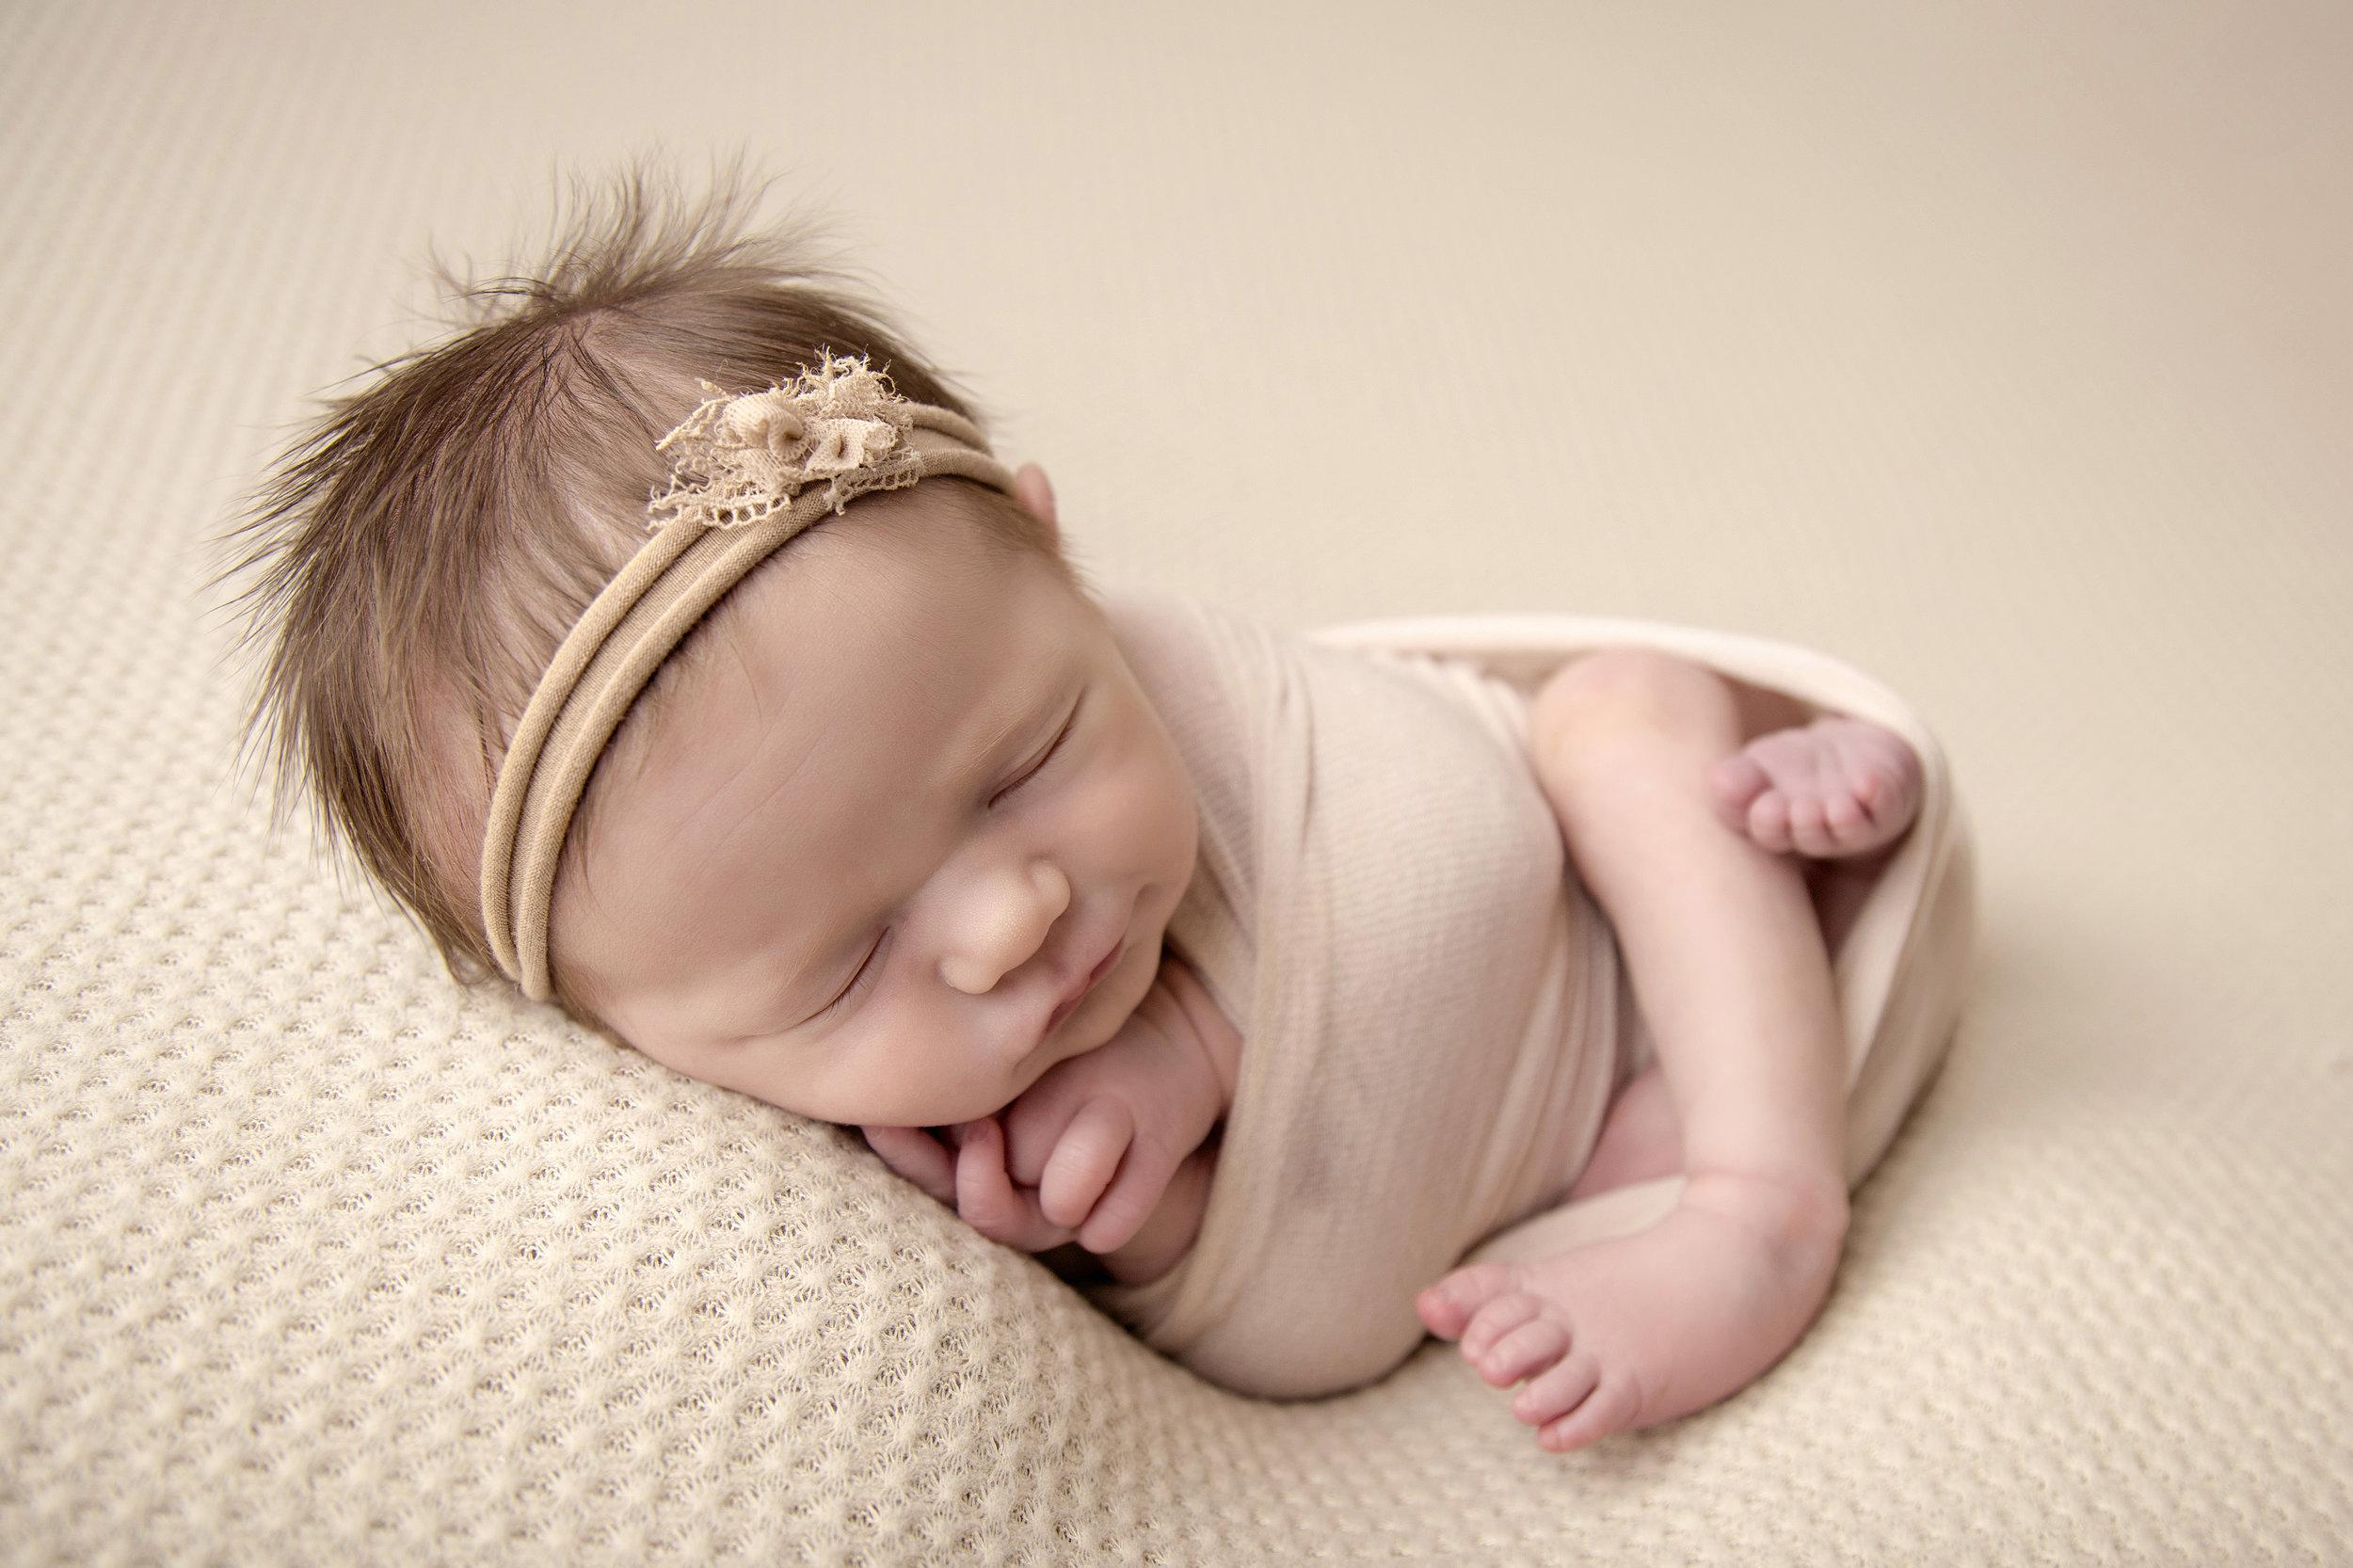 lancaster-newborn-photography-angie-englerth-aep011.jpg